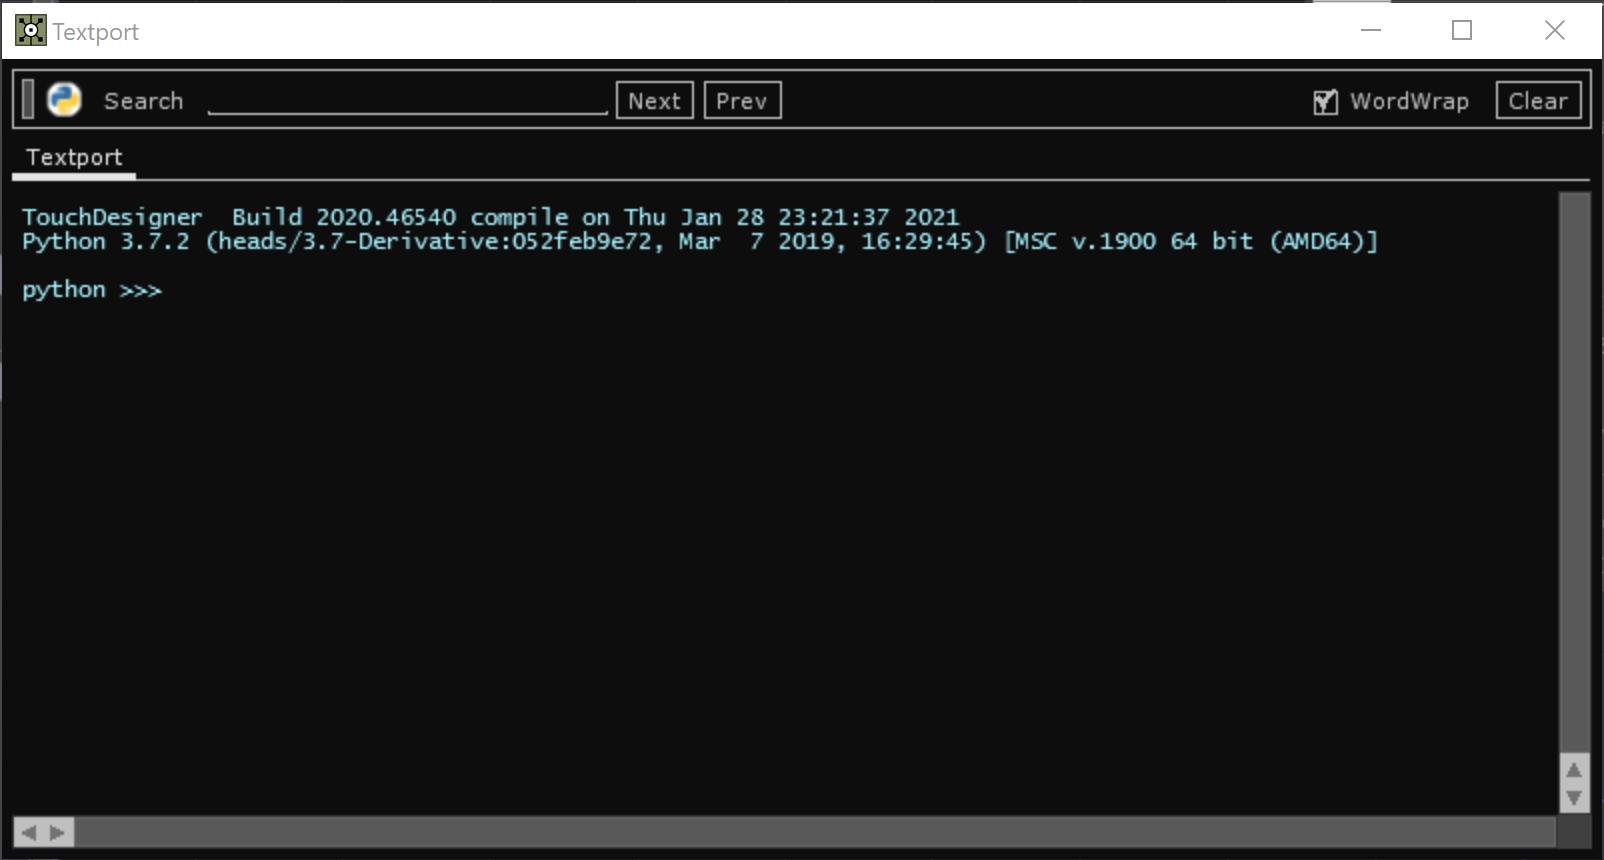 Screenshot 2021-01-29 170559.png